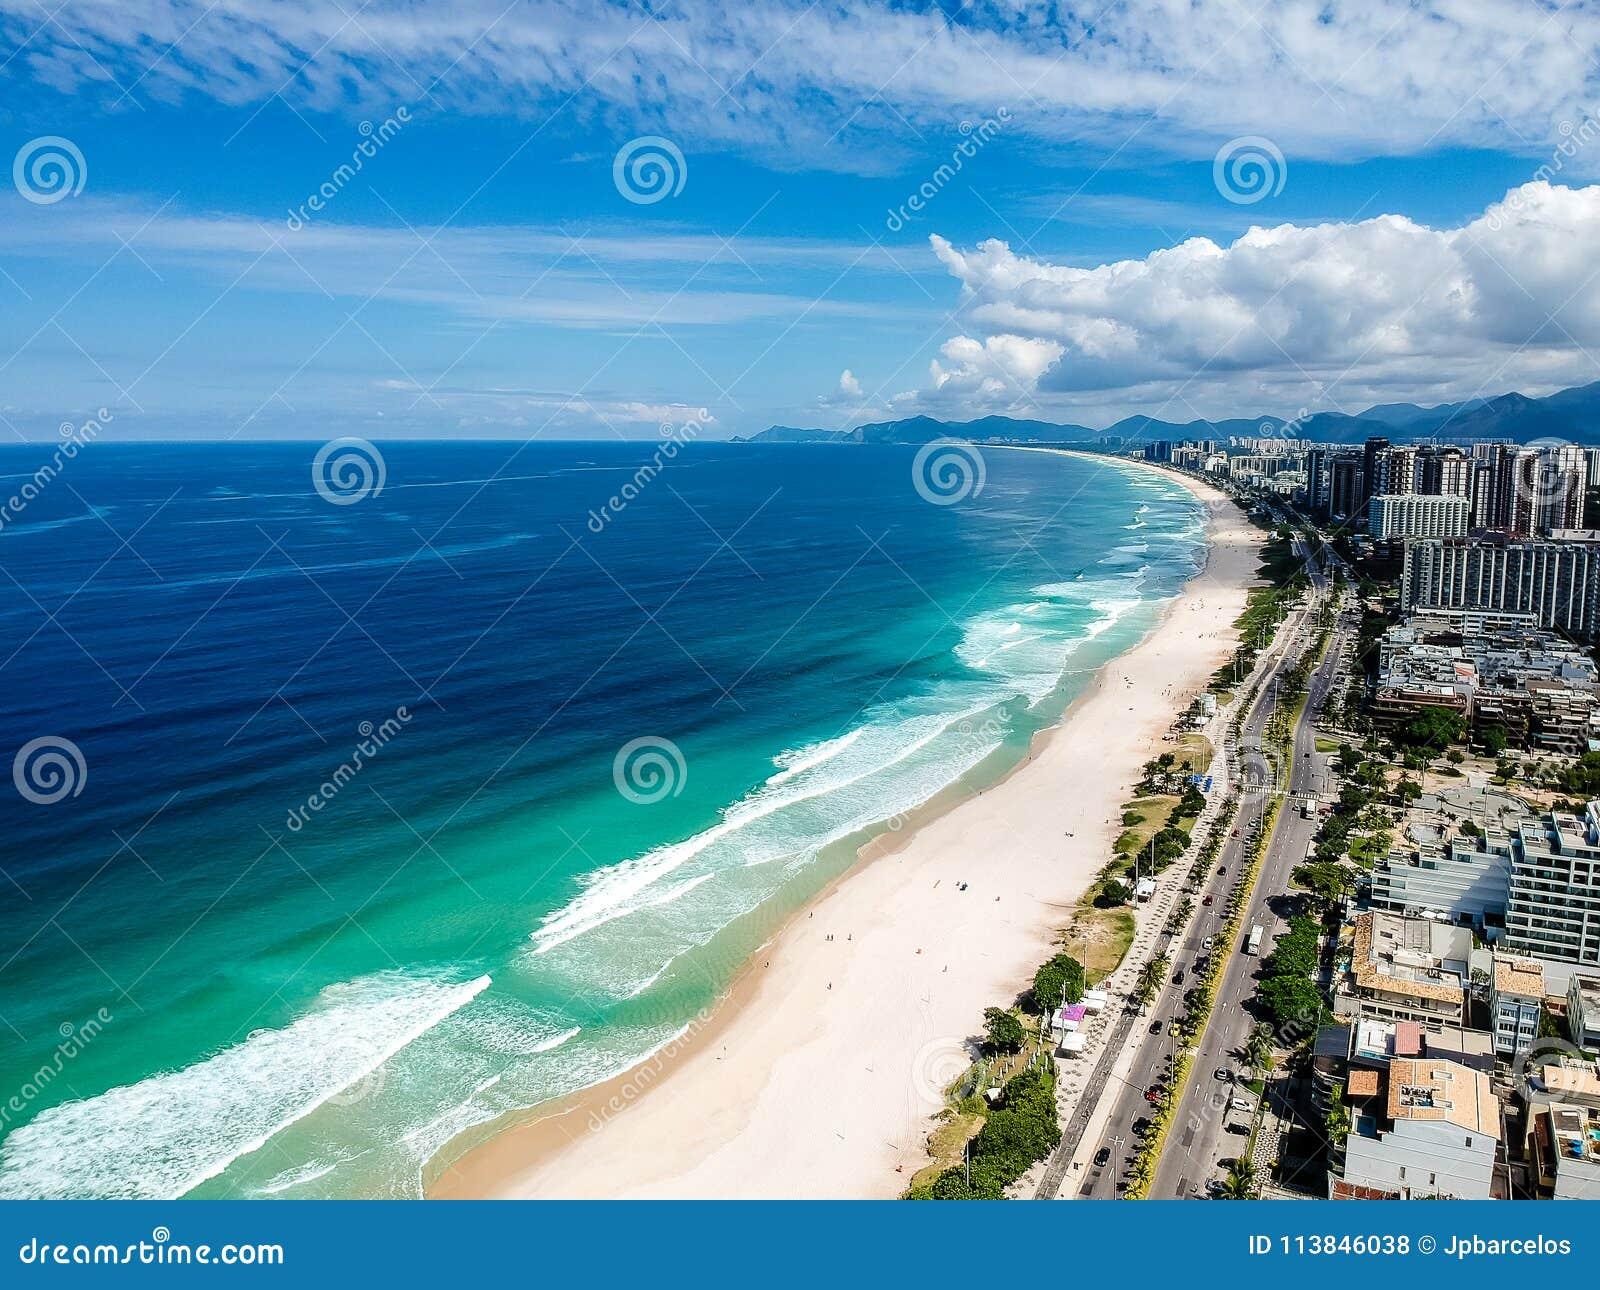 Foto del abejón de la playa de Barra da Tijuca, Rio de Janeiro, el Brasil